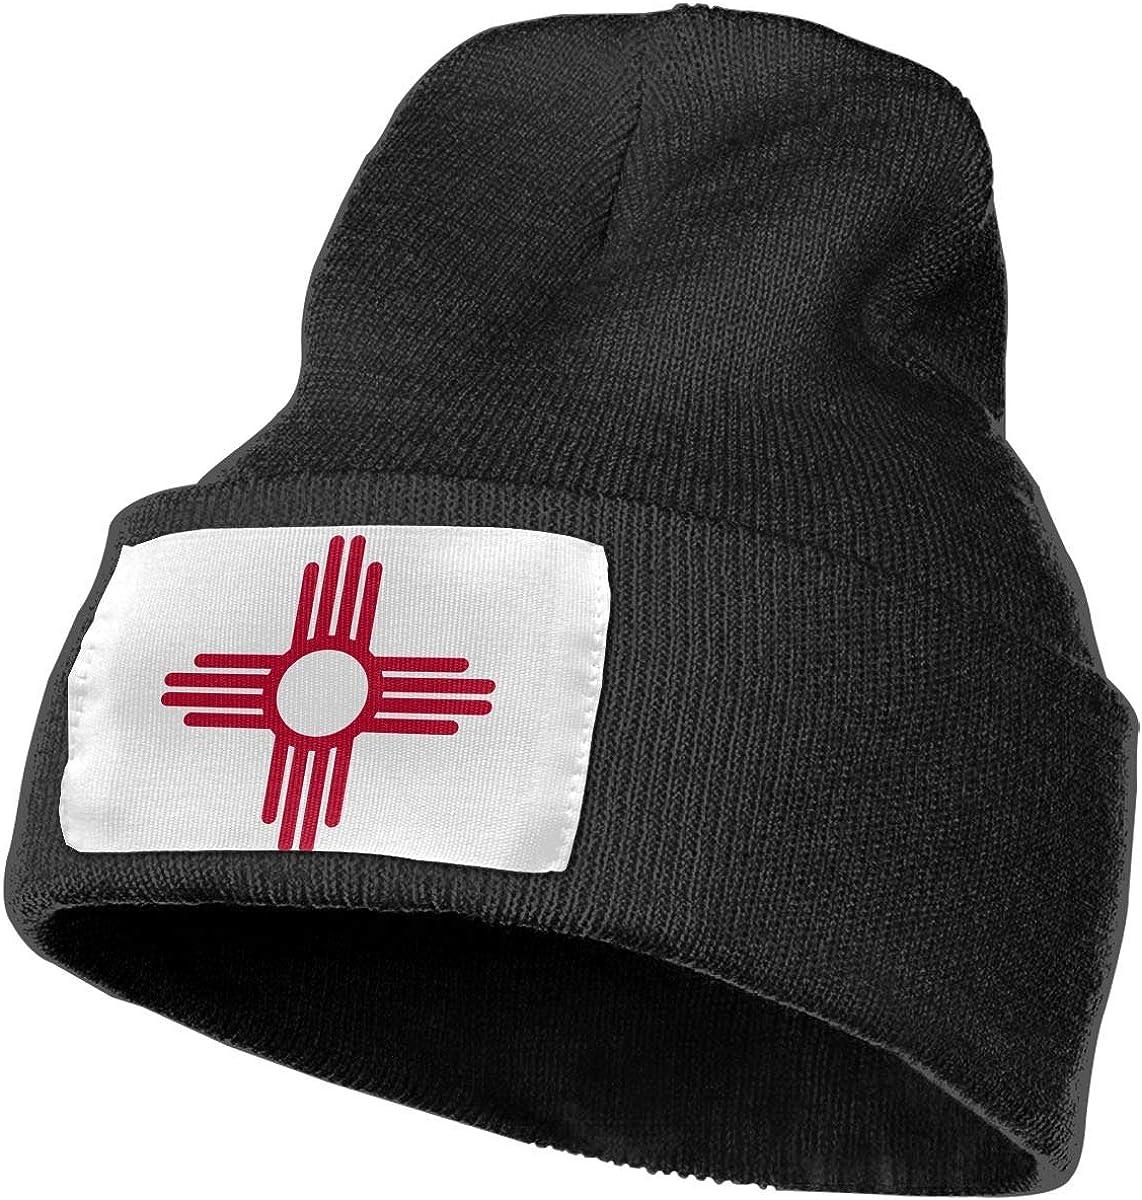 New Mexico State Flag Beanie Skull Cap Stylish Knit Beanie Hats Plain Winter Hats for Men Women Daily